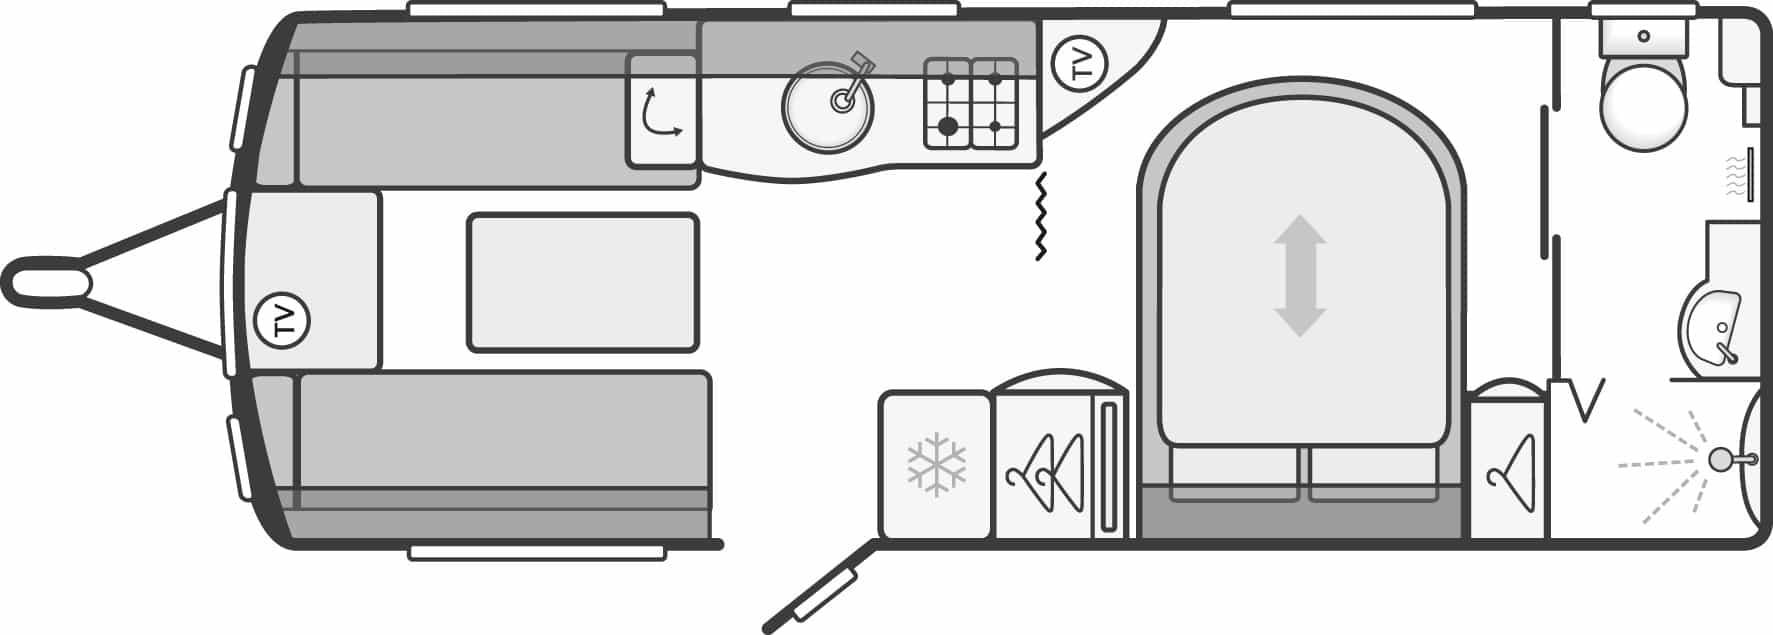 Conqueror 580 - 4 Berth, Transverse Fixed Bed, End Washroom